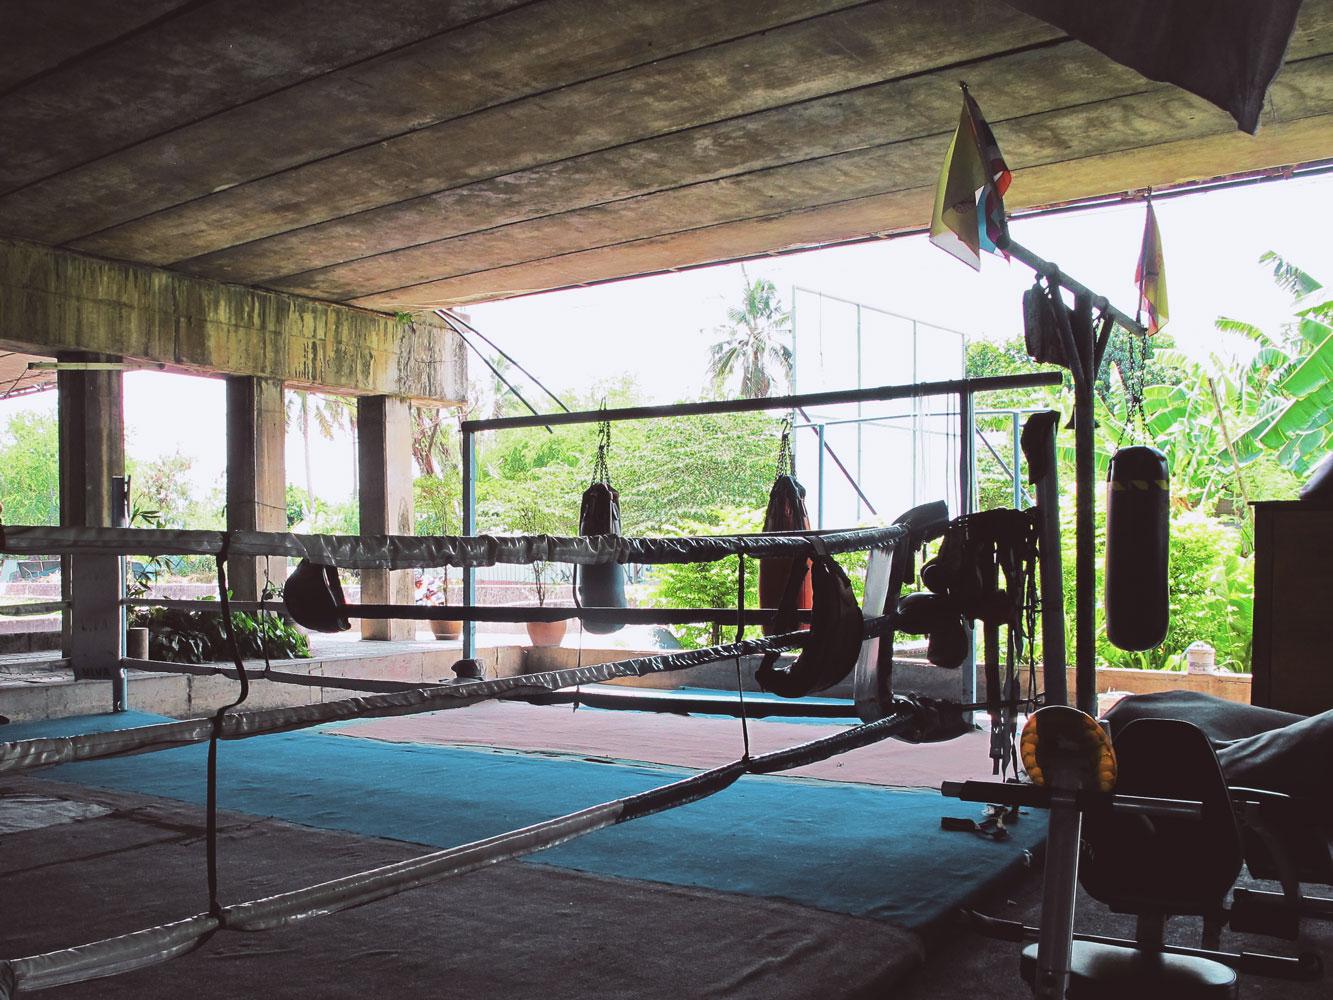 Muay Thai boxing stadium filming location in Bangkok Thailand